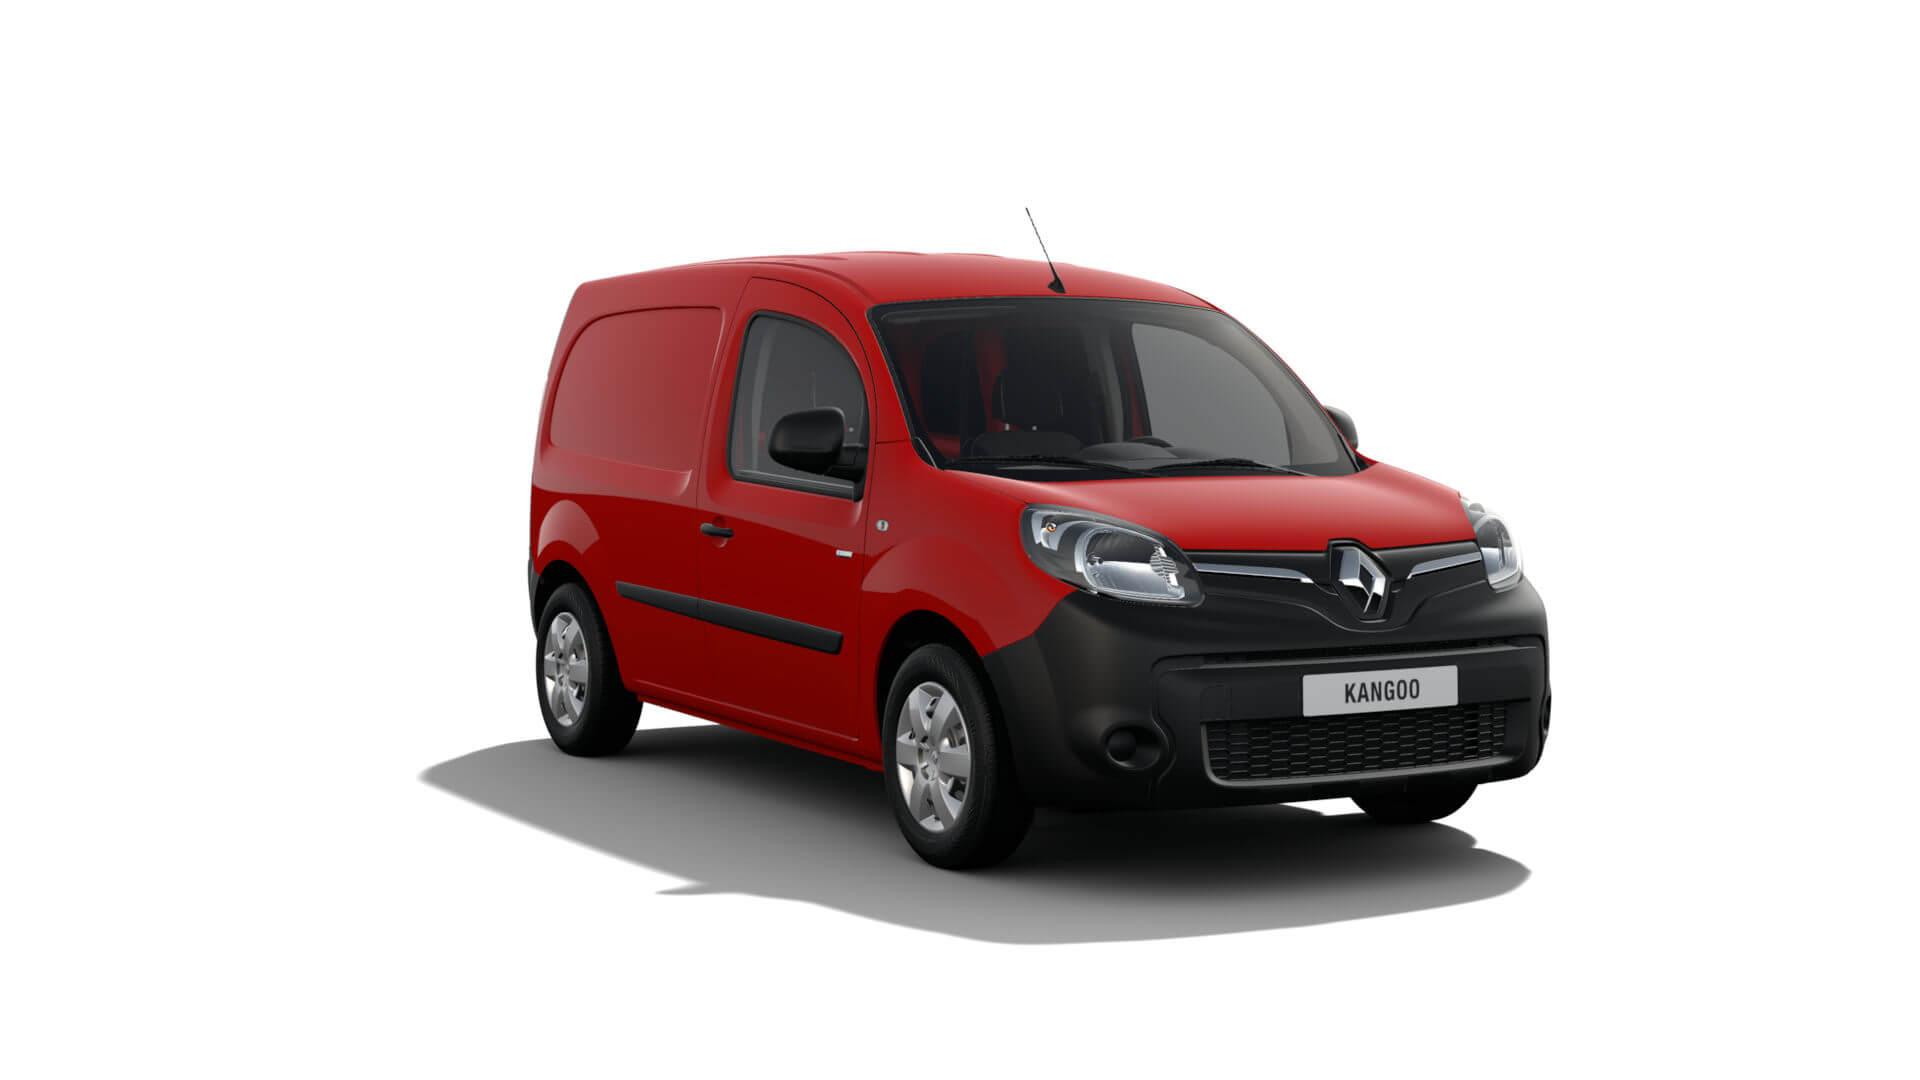 Automodell rot - Renault Kangoo NFZ - Renault Ahrens Hannover